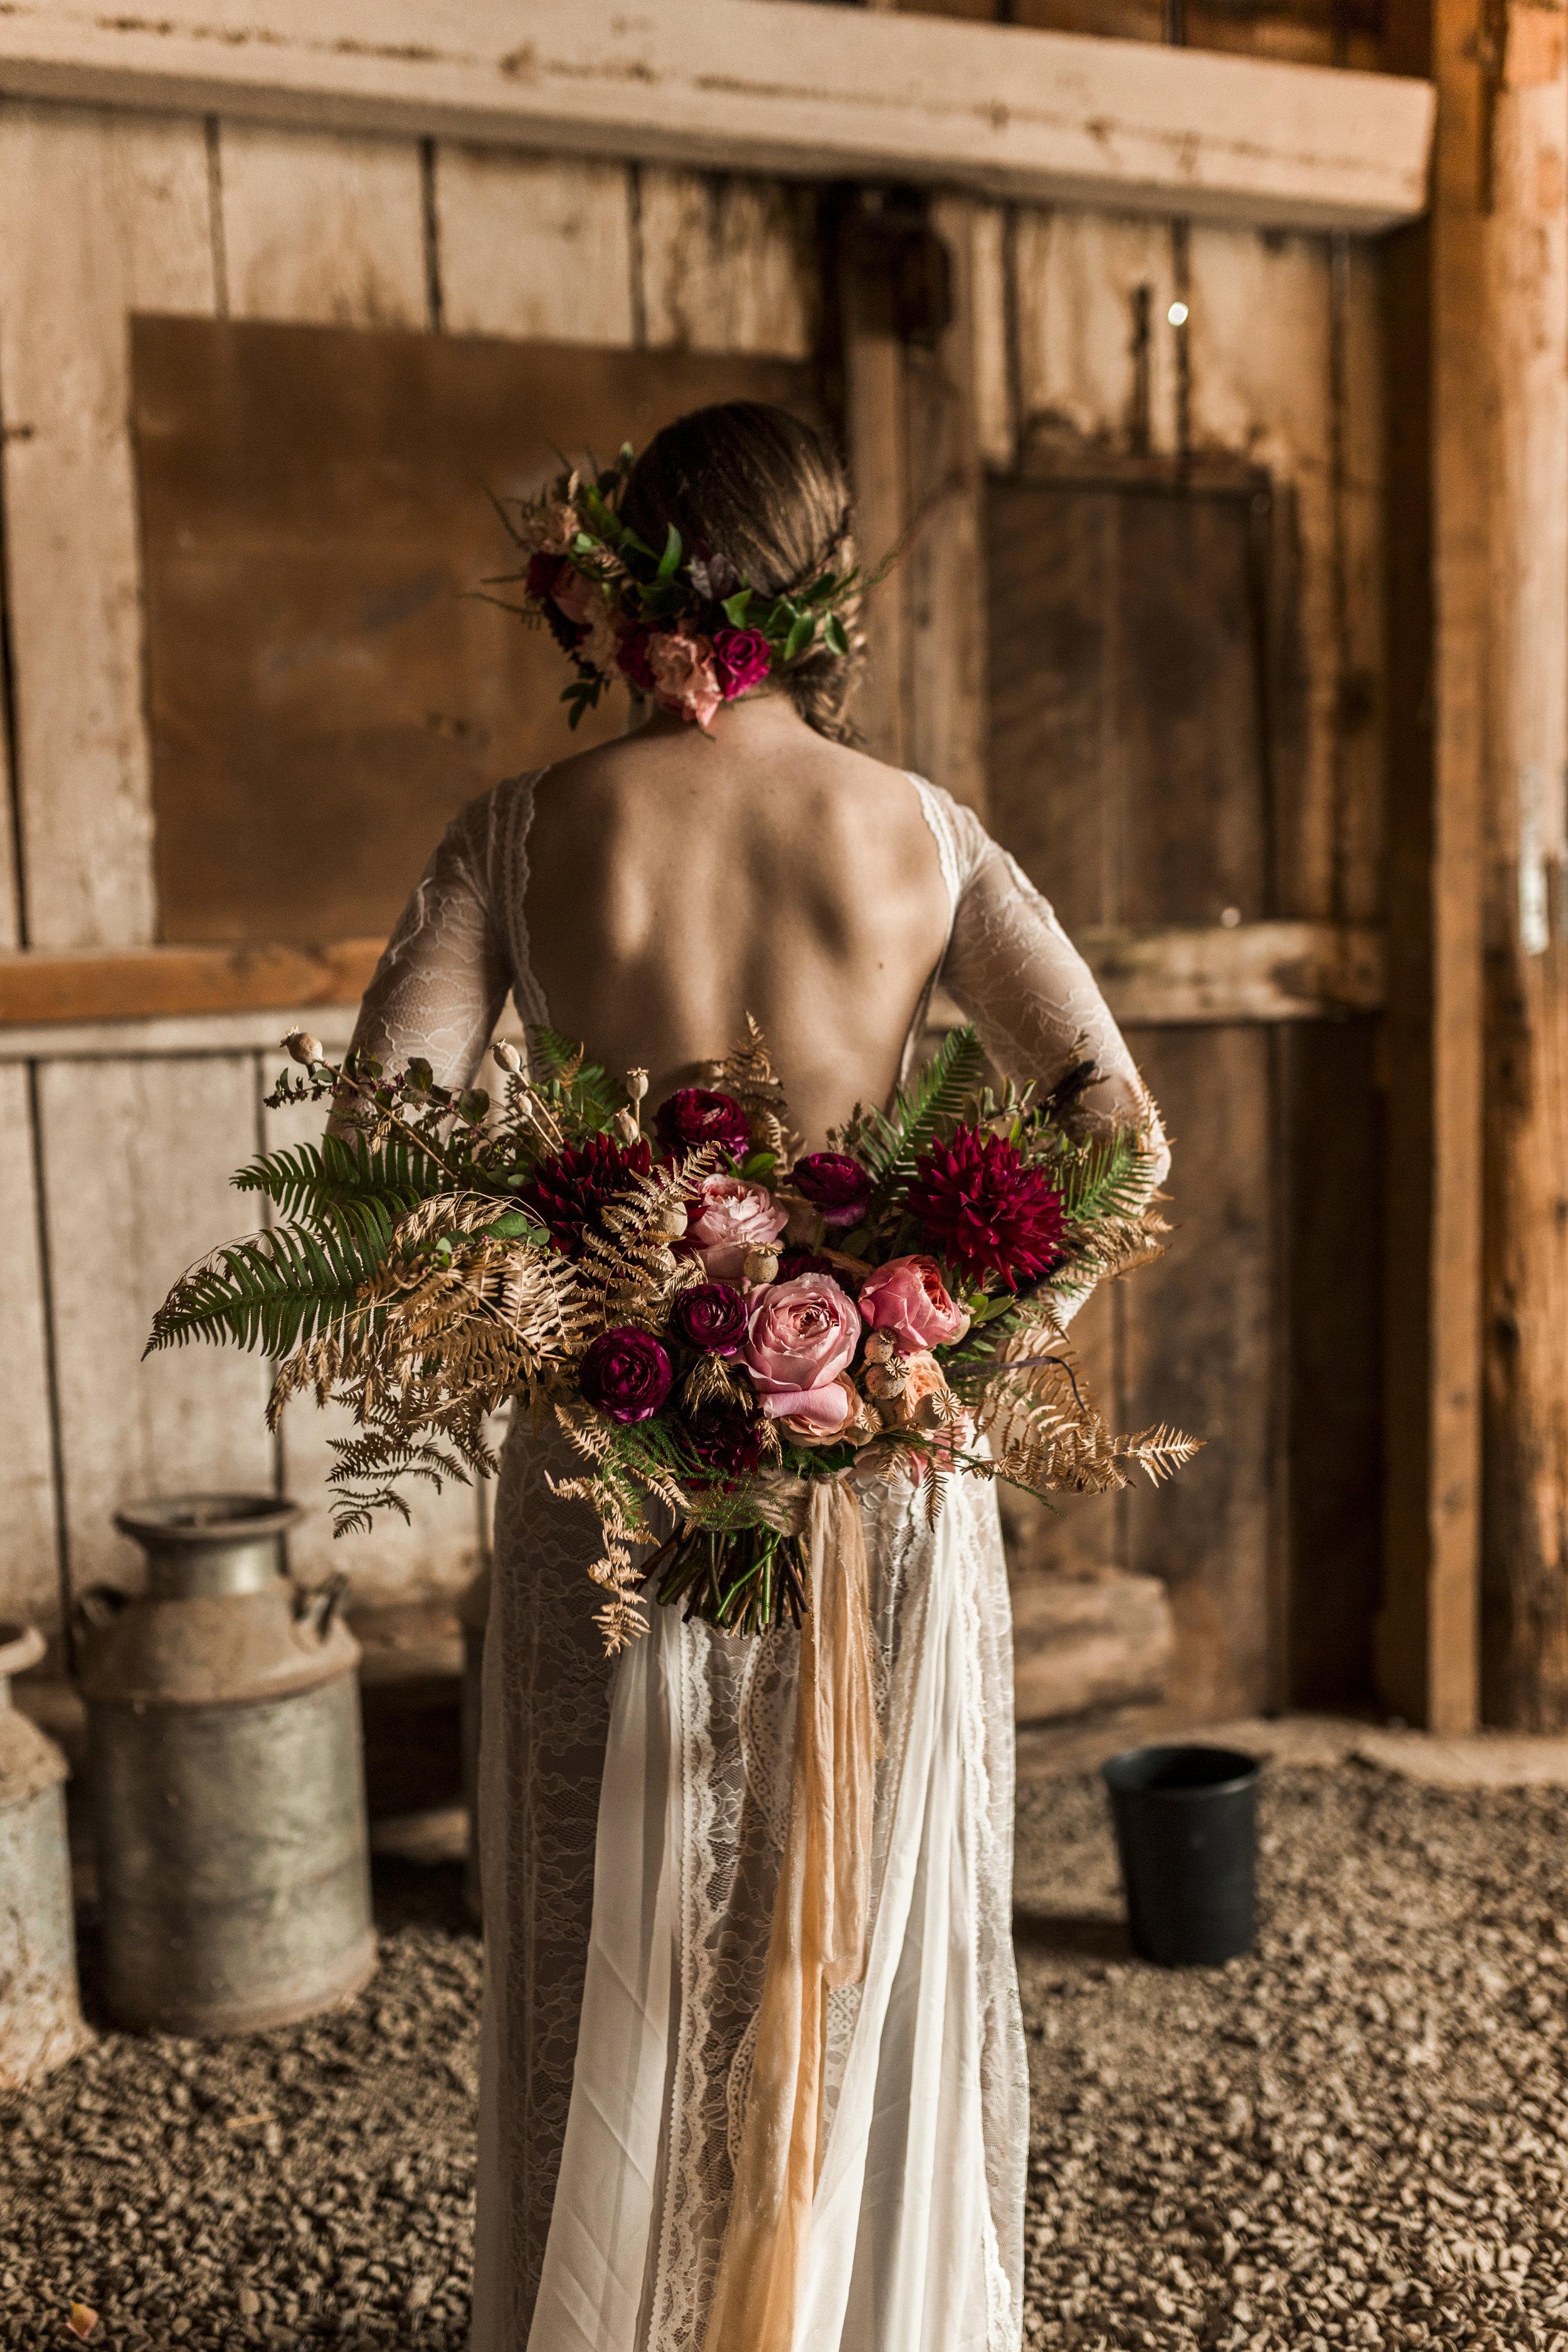 PNW Elopement | Forest Grove, Oregon | Bri Bergman Photography 015.JPG